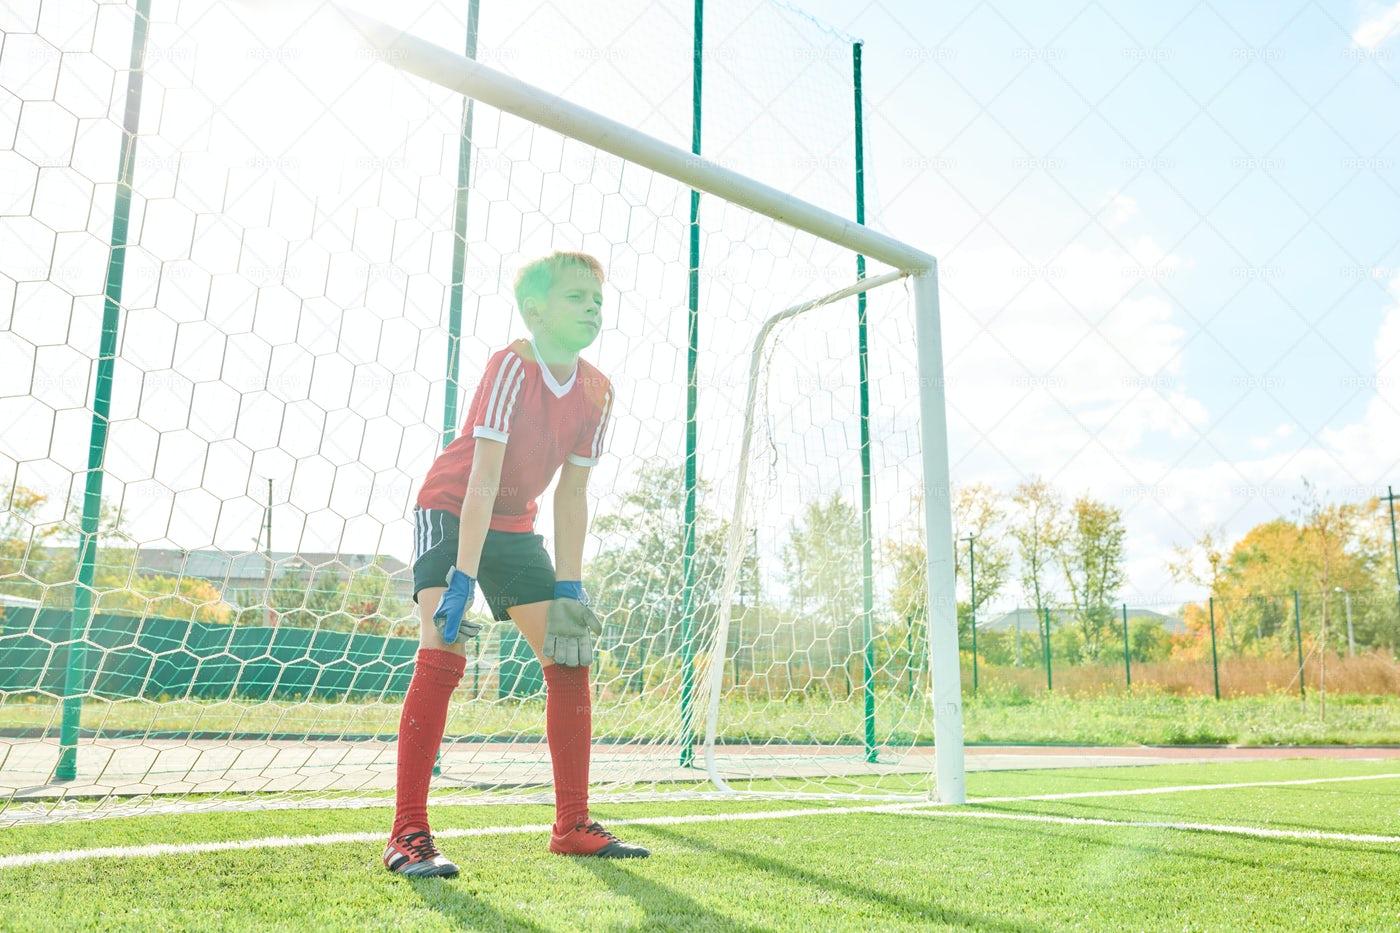 Boy Defending Gate In Sunlight: Stock Photos